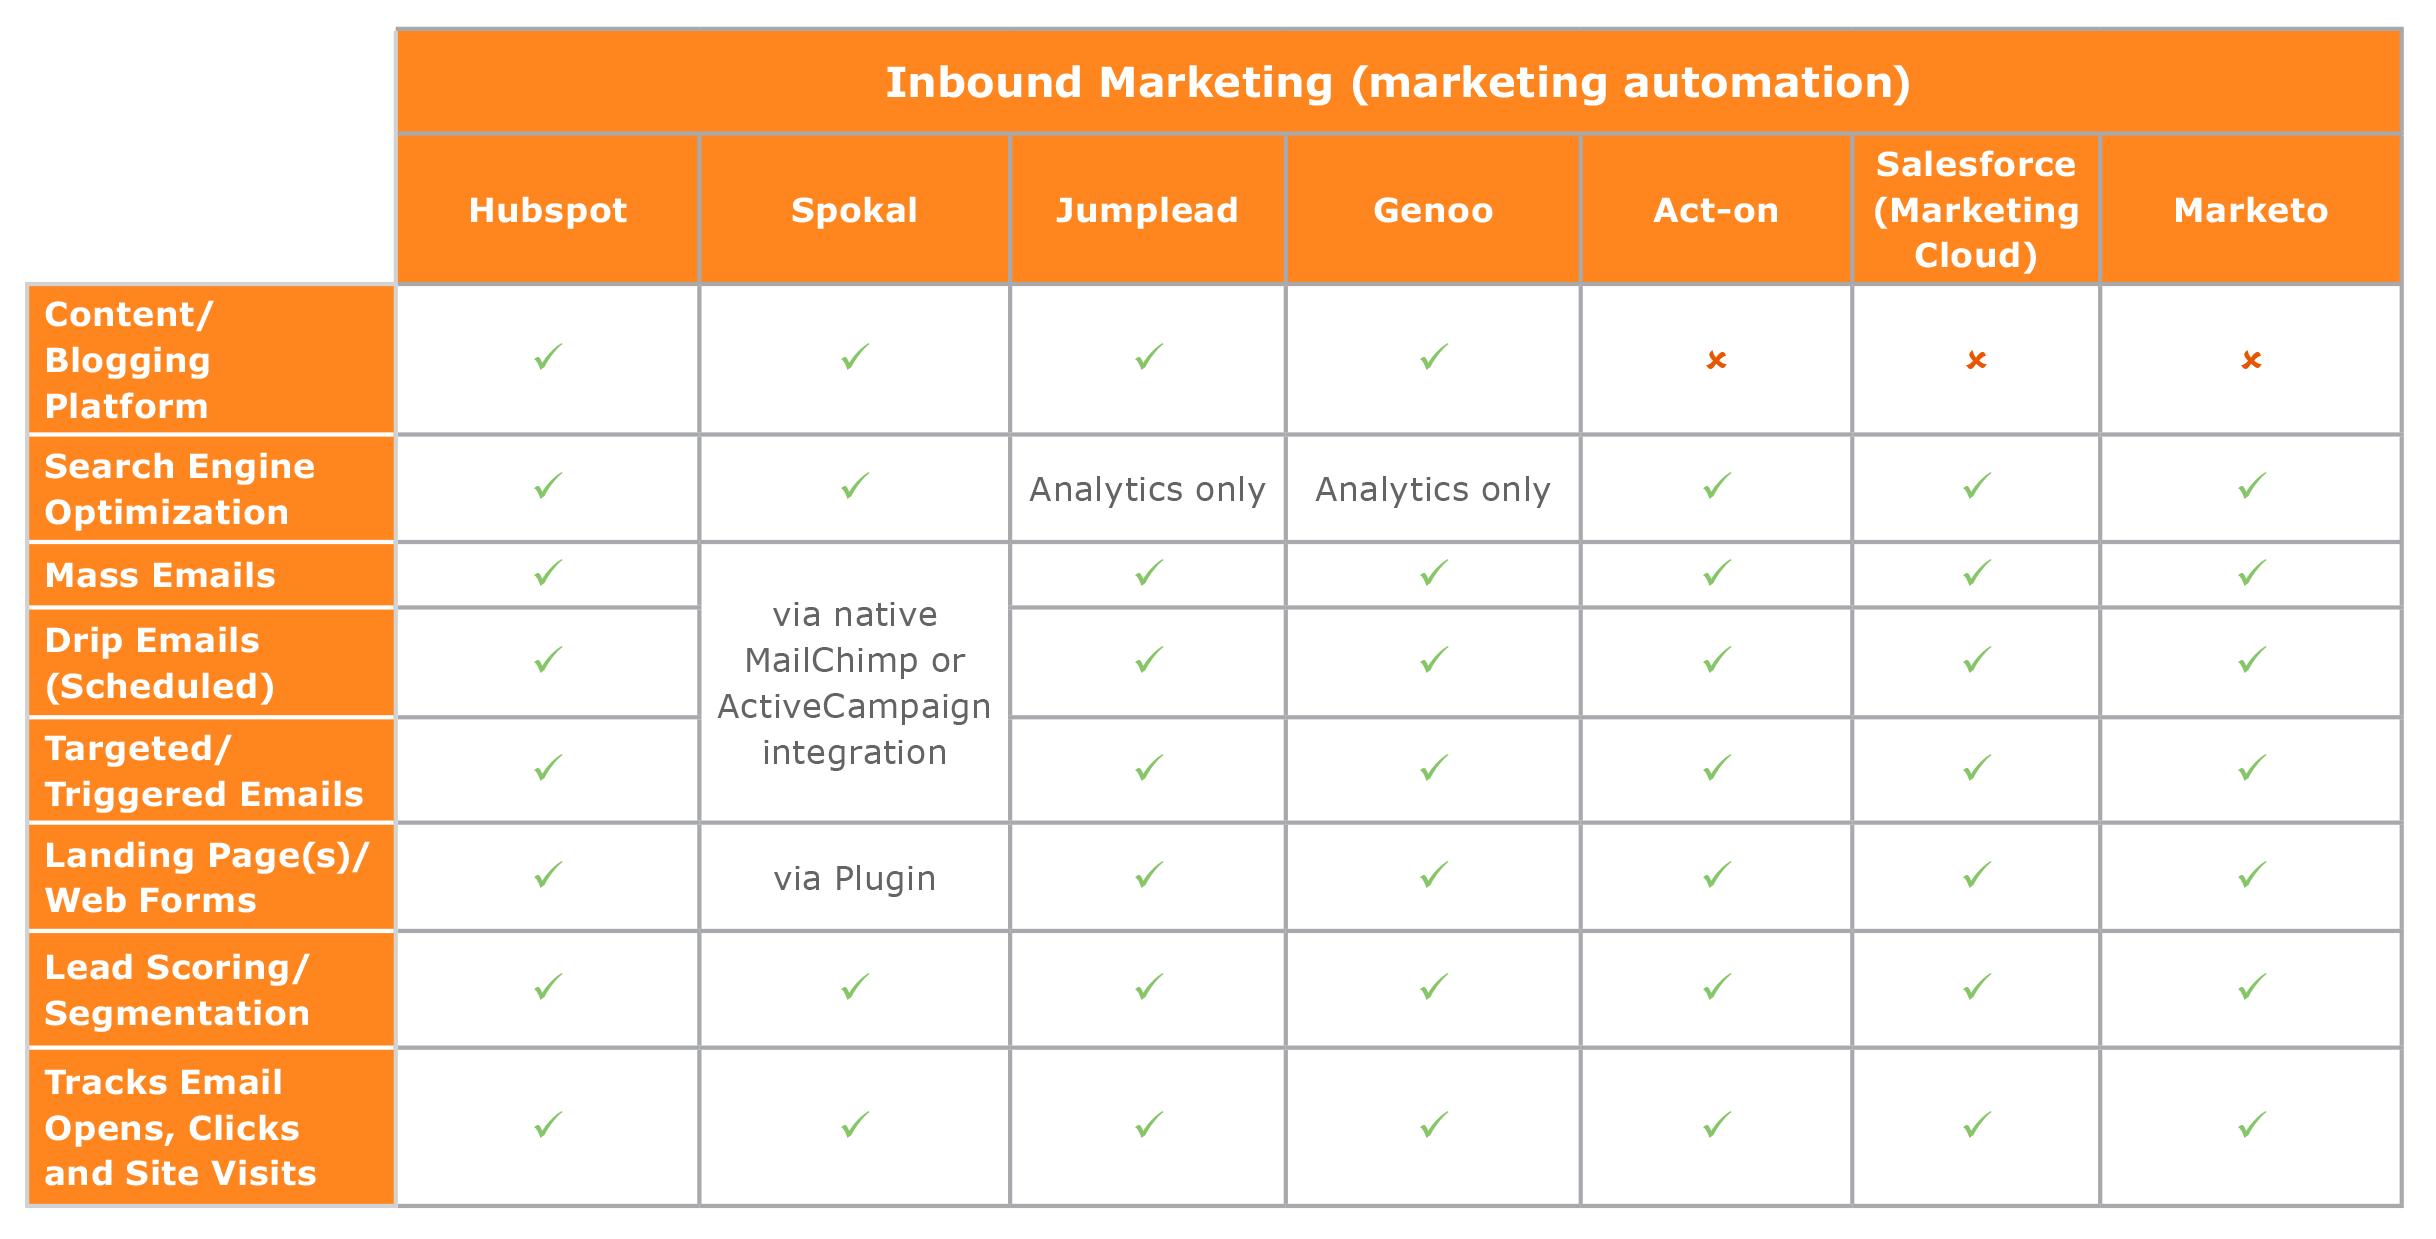 inbound marketing vendor comparison